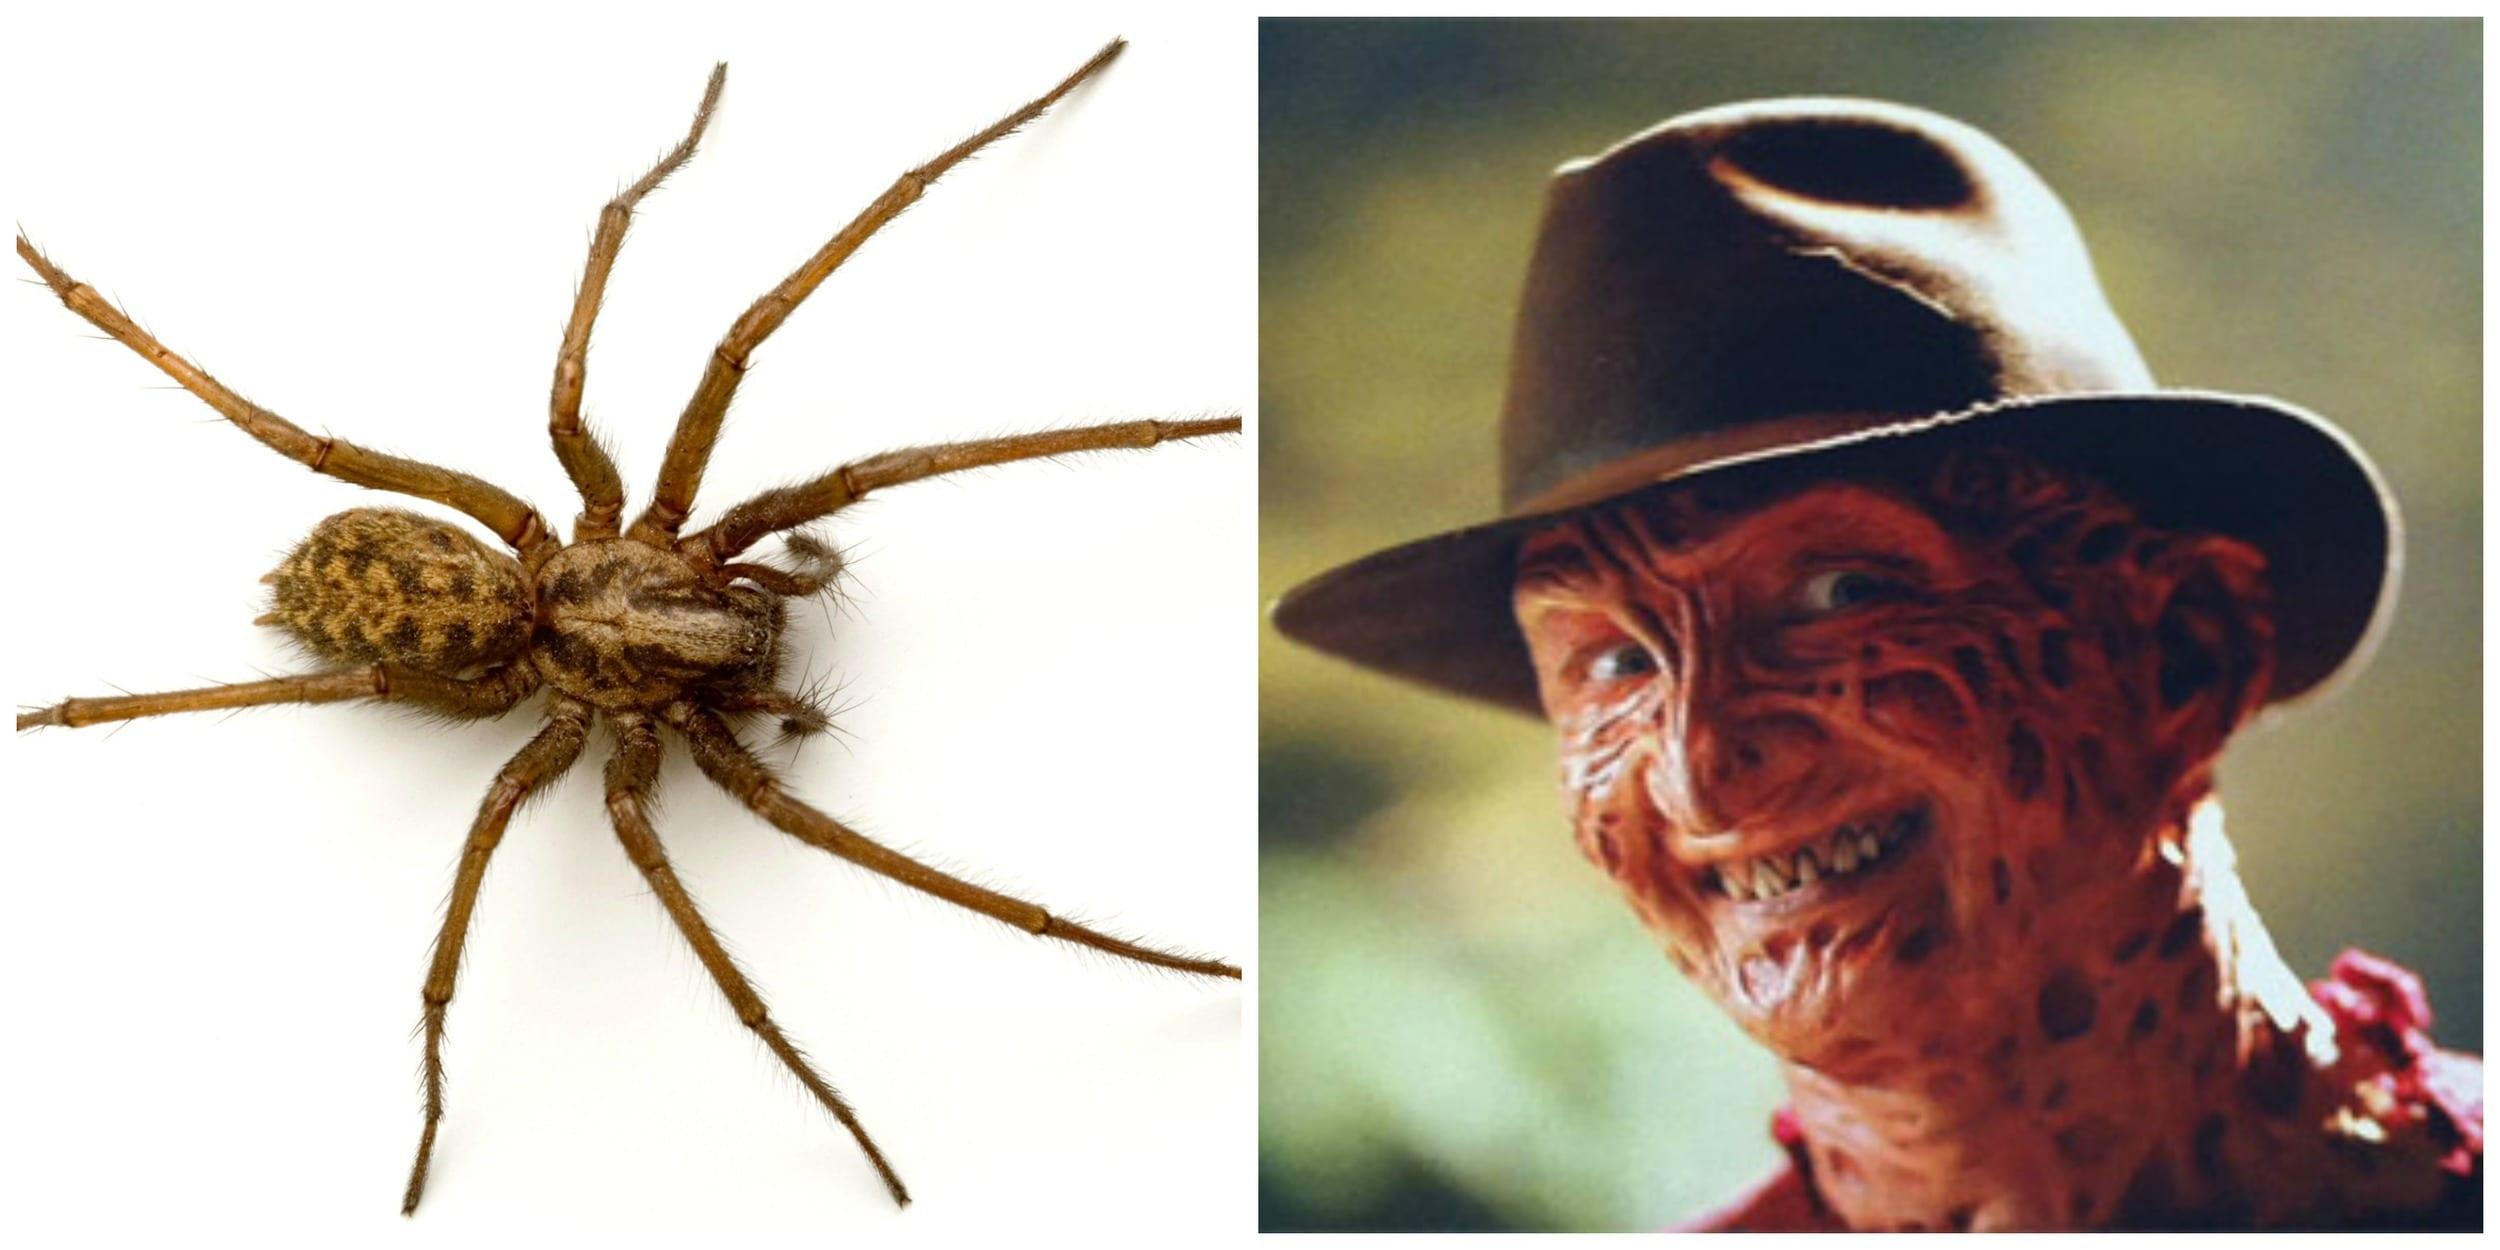 Spider+&+Freddy+Krueger.jpgSpider+&+Freddy+Krueger